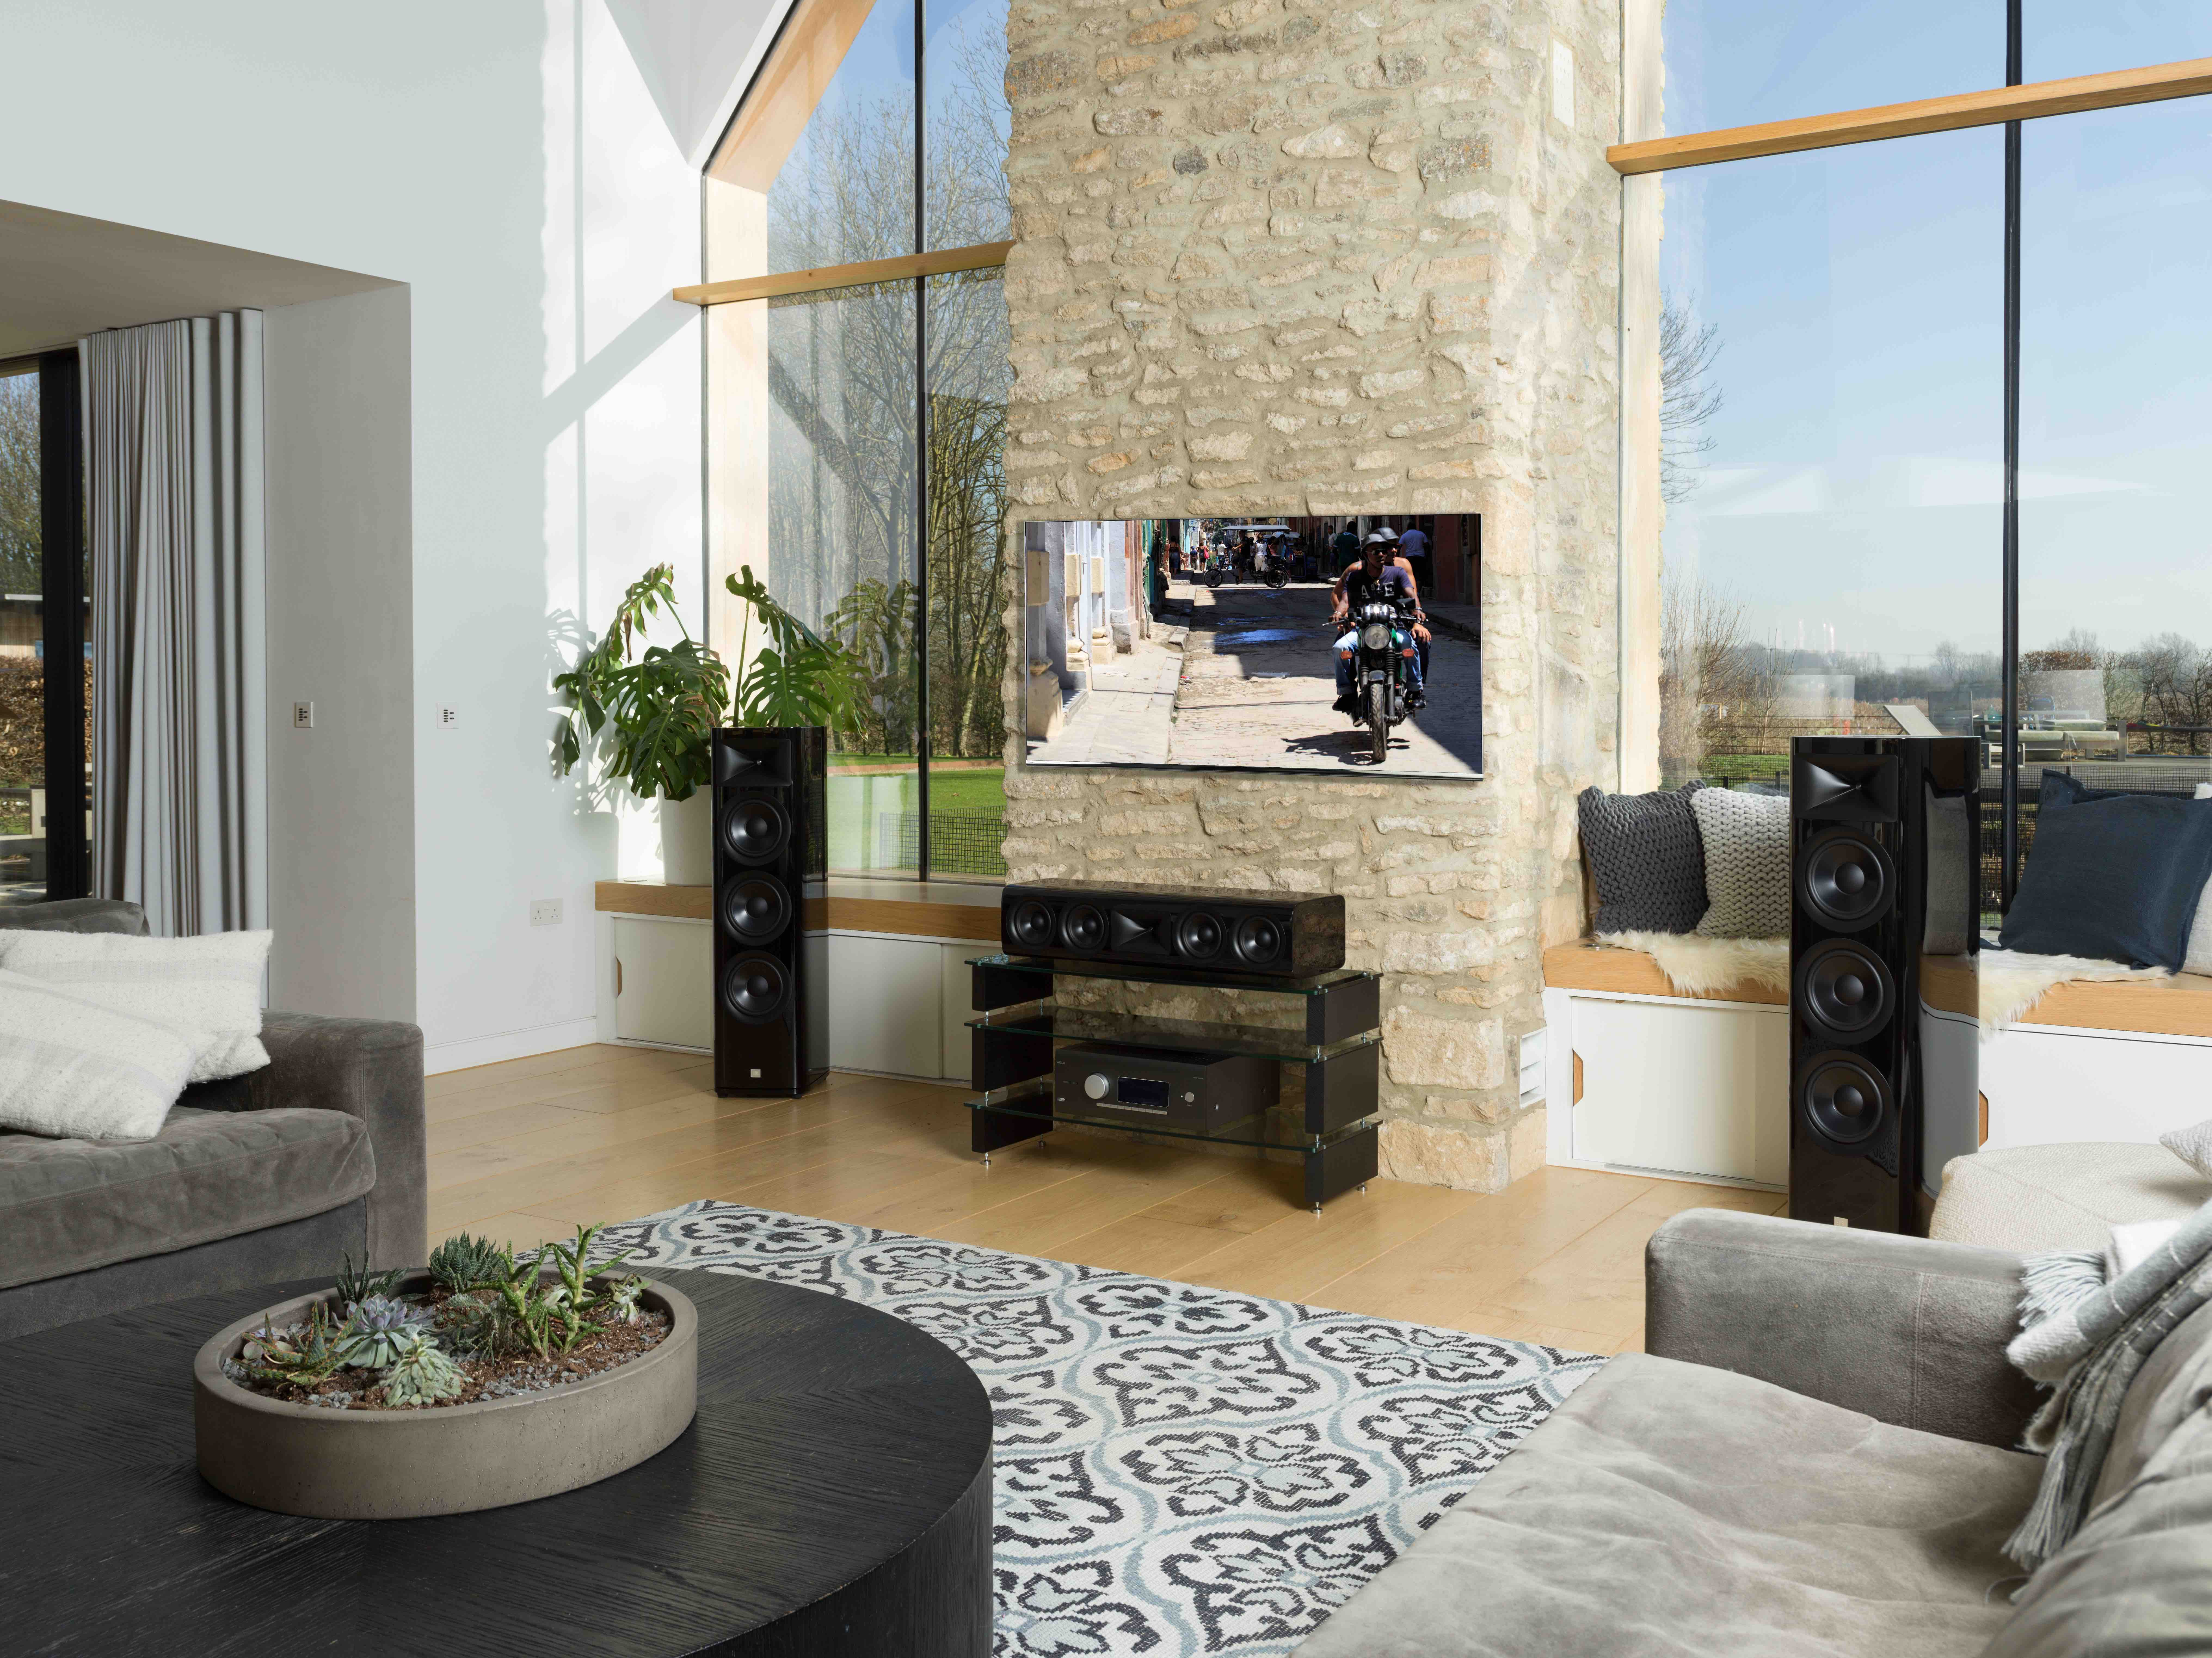 JBL HDI seria kolumn luxury audio